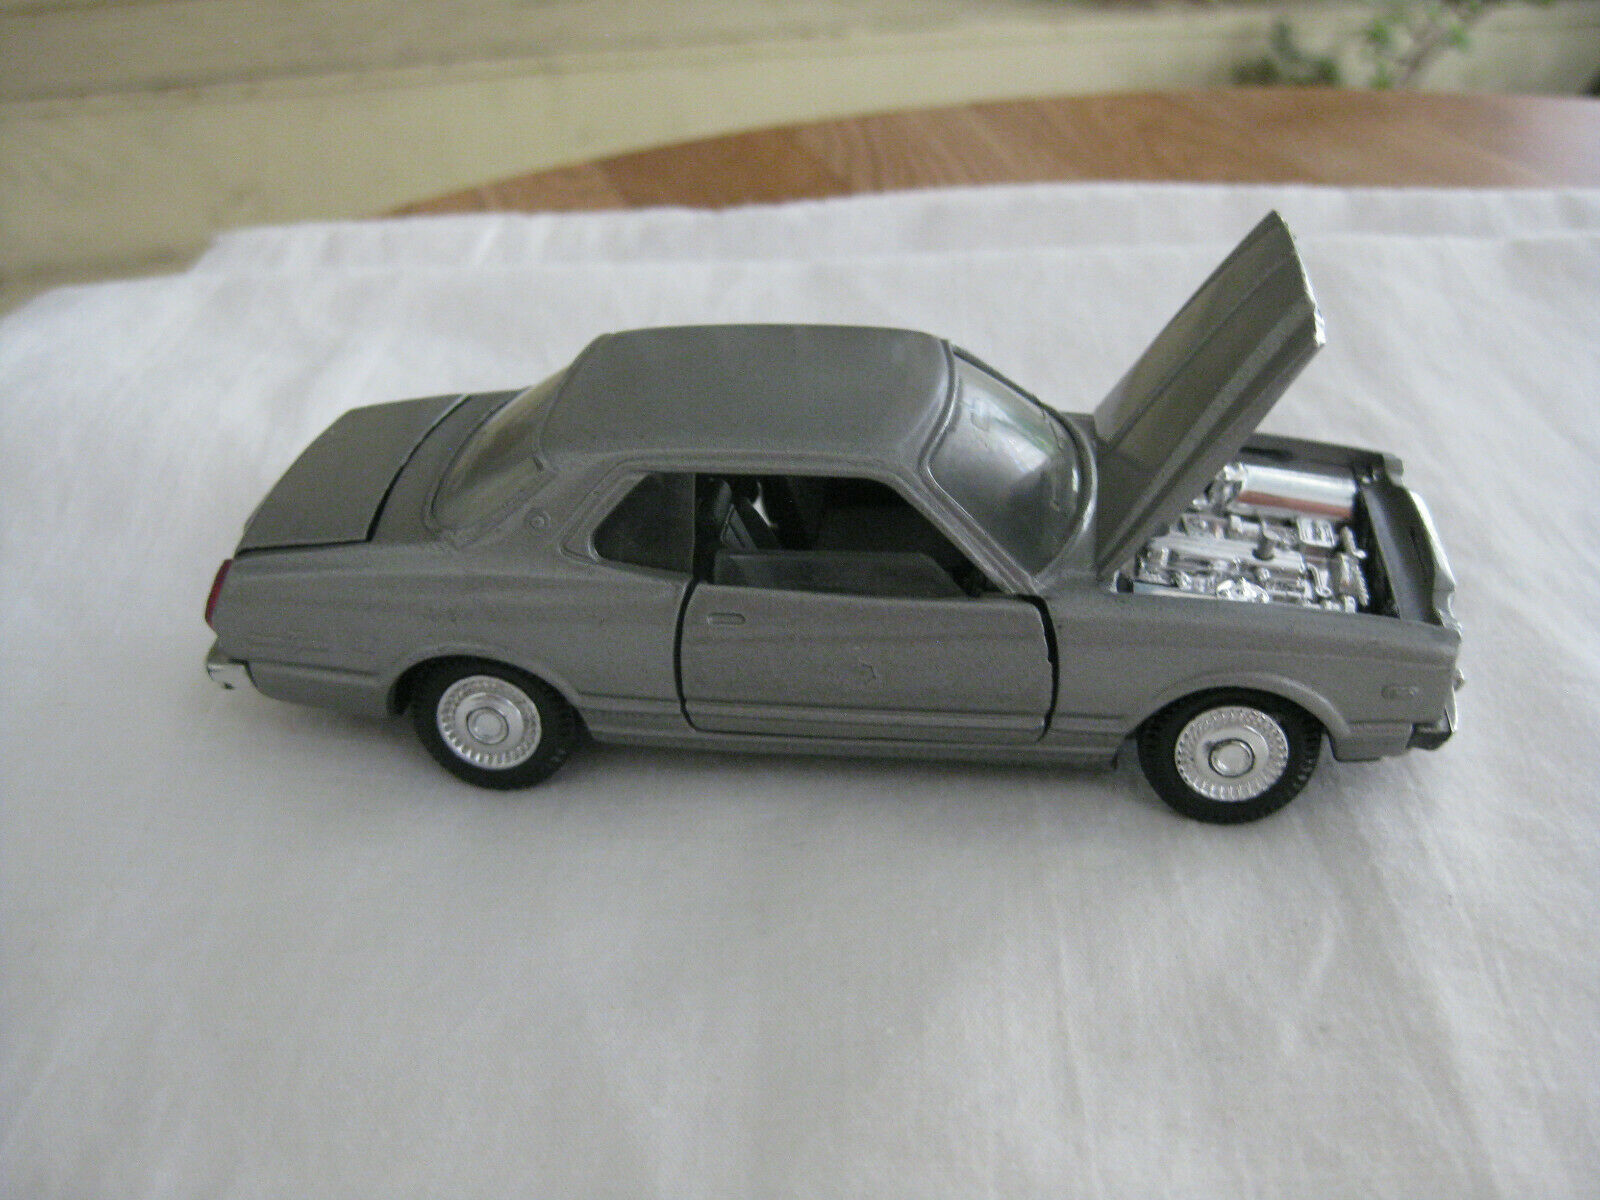 Diapet Yonezawa Toys Mark II Grande HT G-63